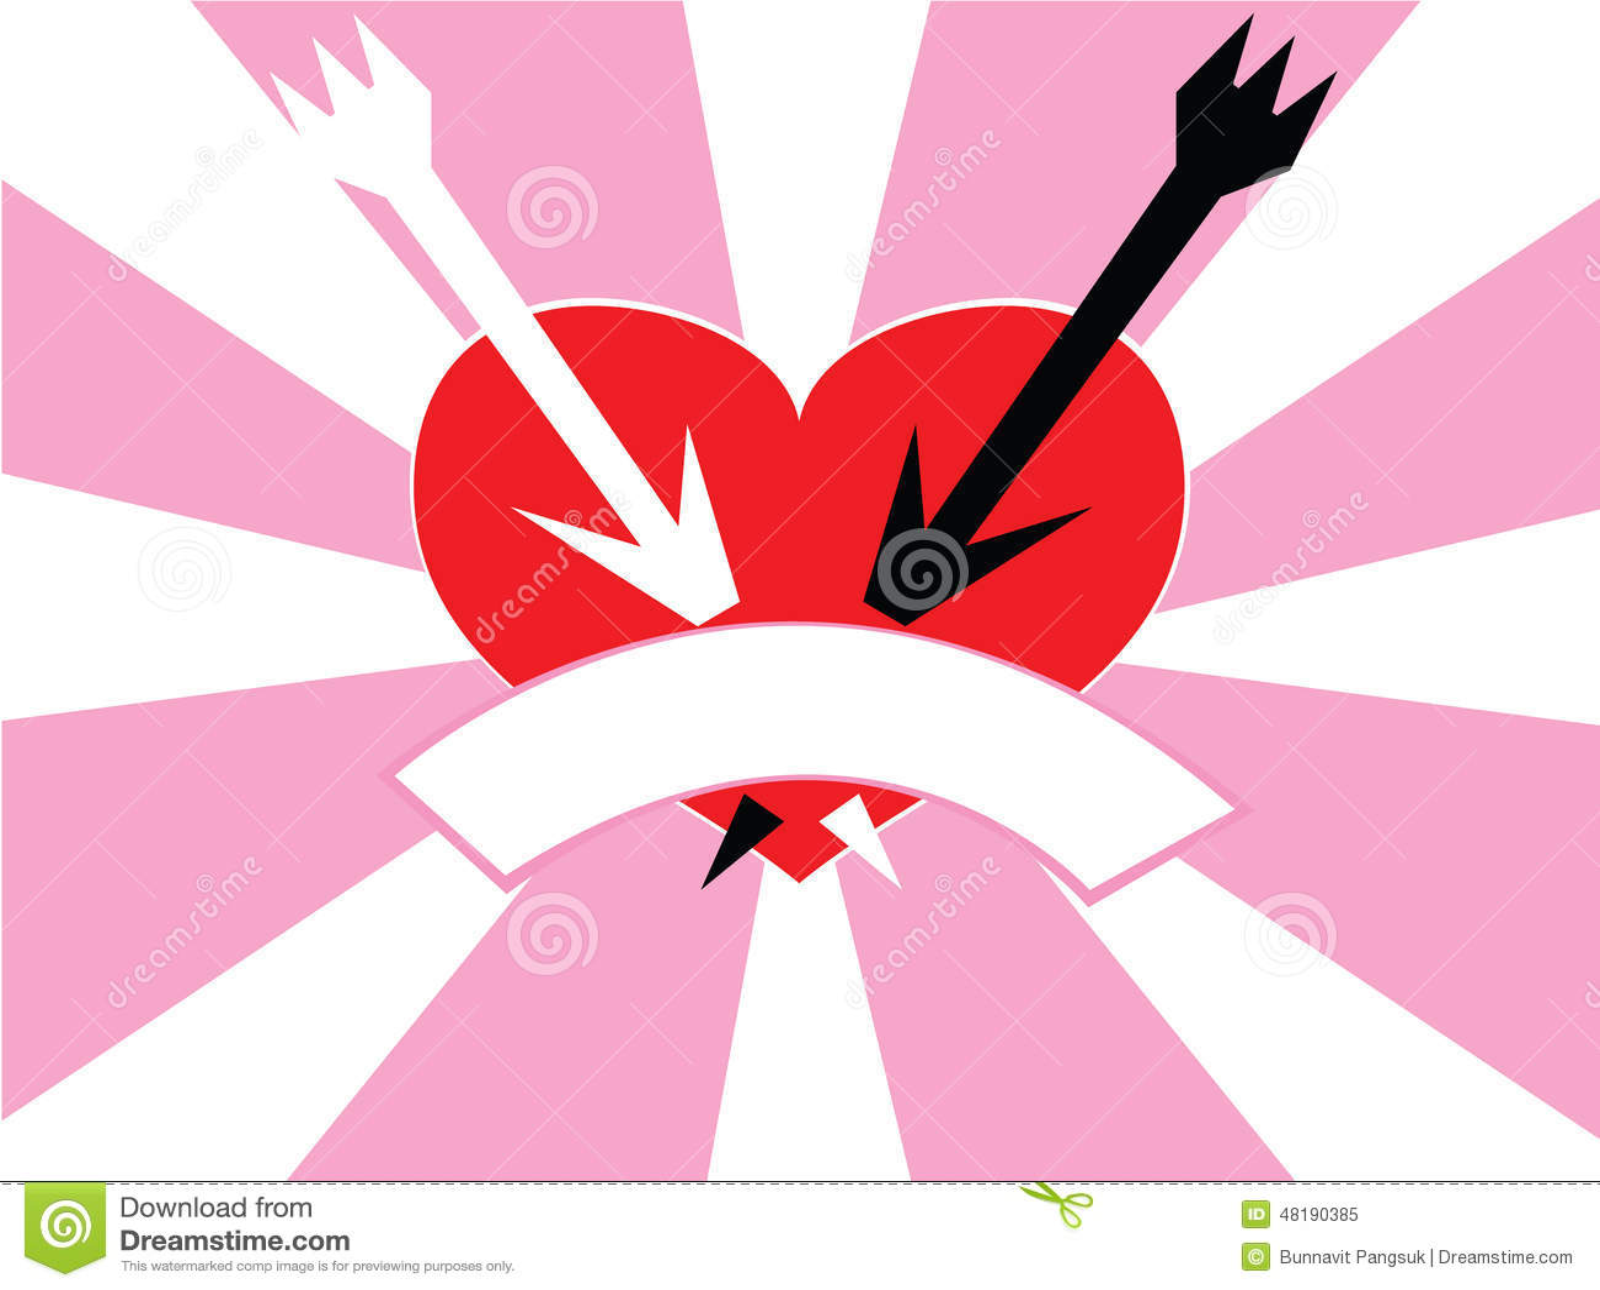 heart and arrow stock illustration image 48190385. Black Bedroom Furniture Sets. Home Design Ideas